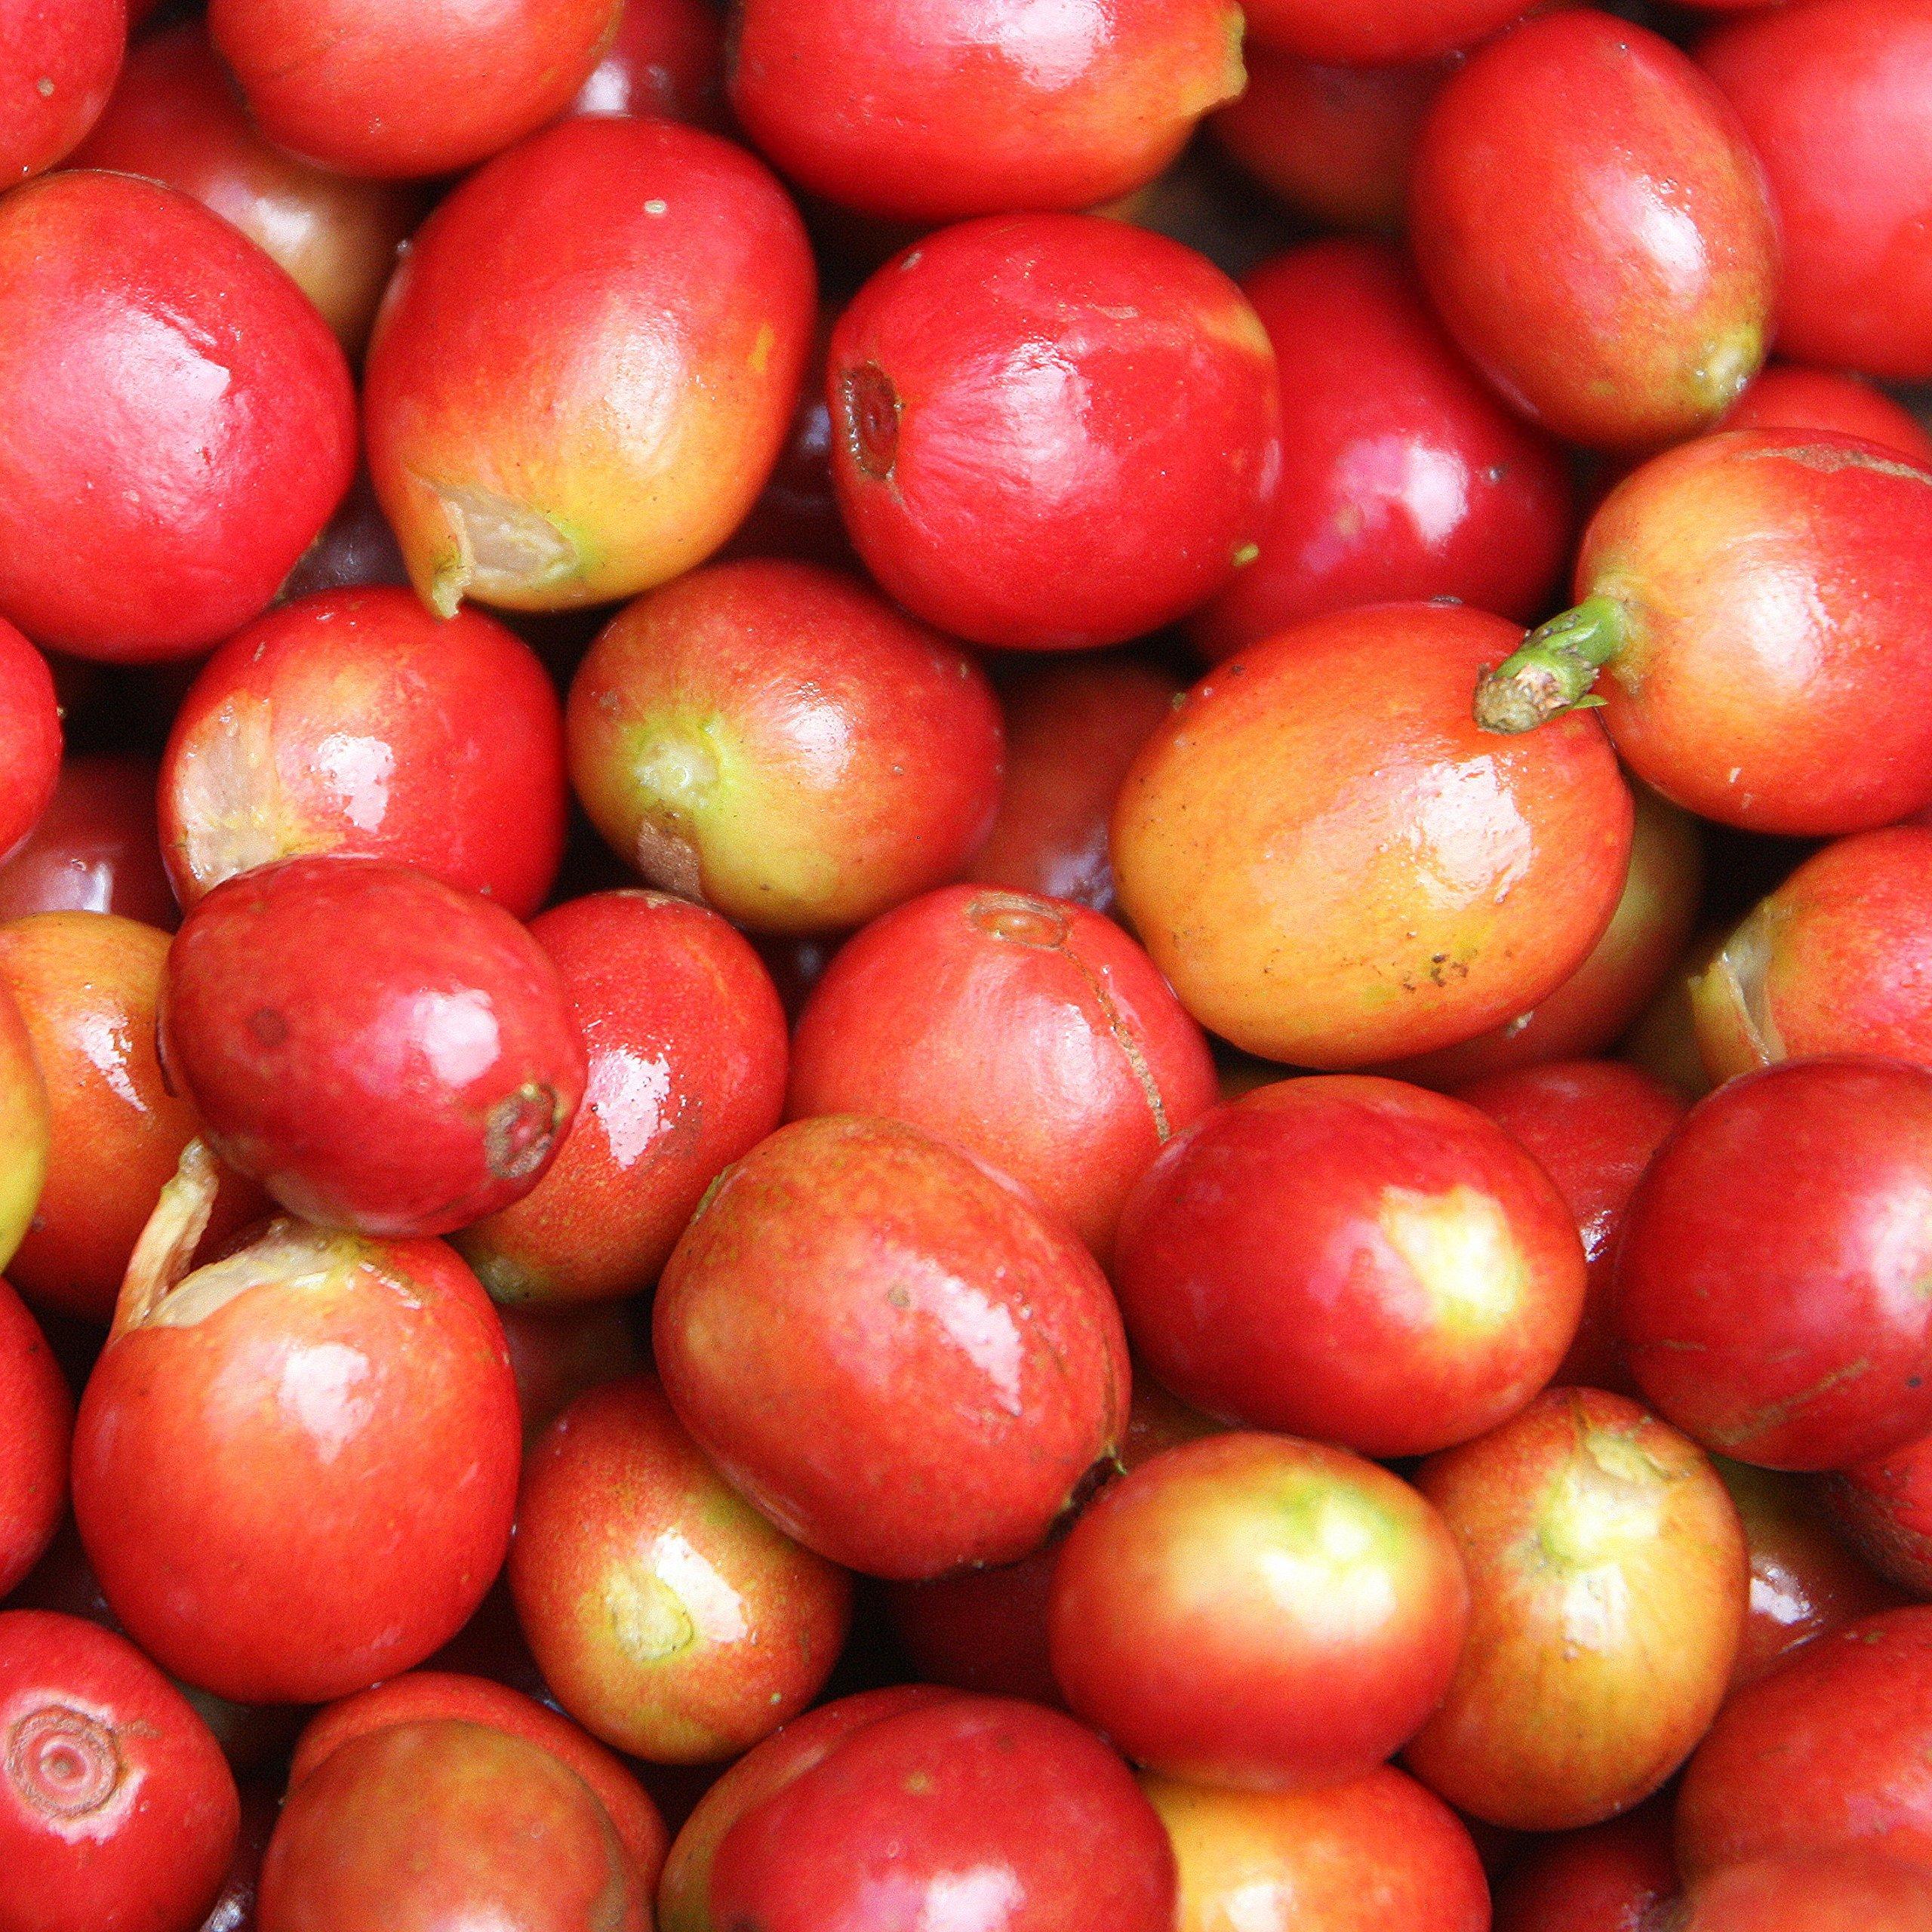 Brazil Decaf (5 LB) Unroasted Green Coffee - Specialty Grade - 100% Arabica Raw Decaffeinated Beans - Bulk Bag Size by Bodhi Leaf Trading Company